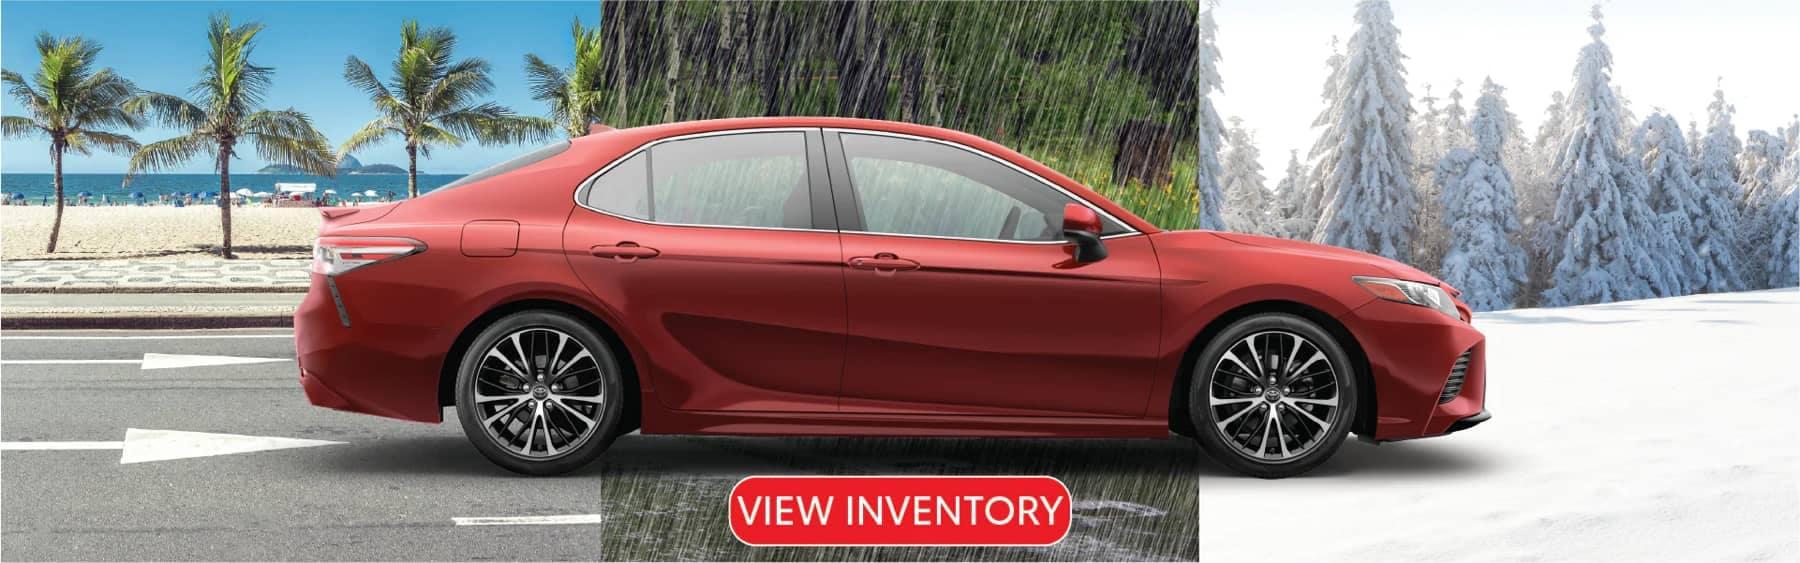 Toyota Camry AWD - hero image